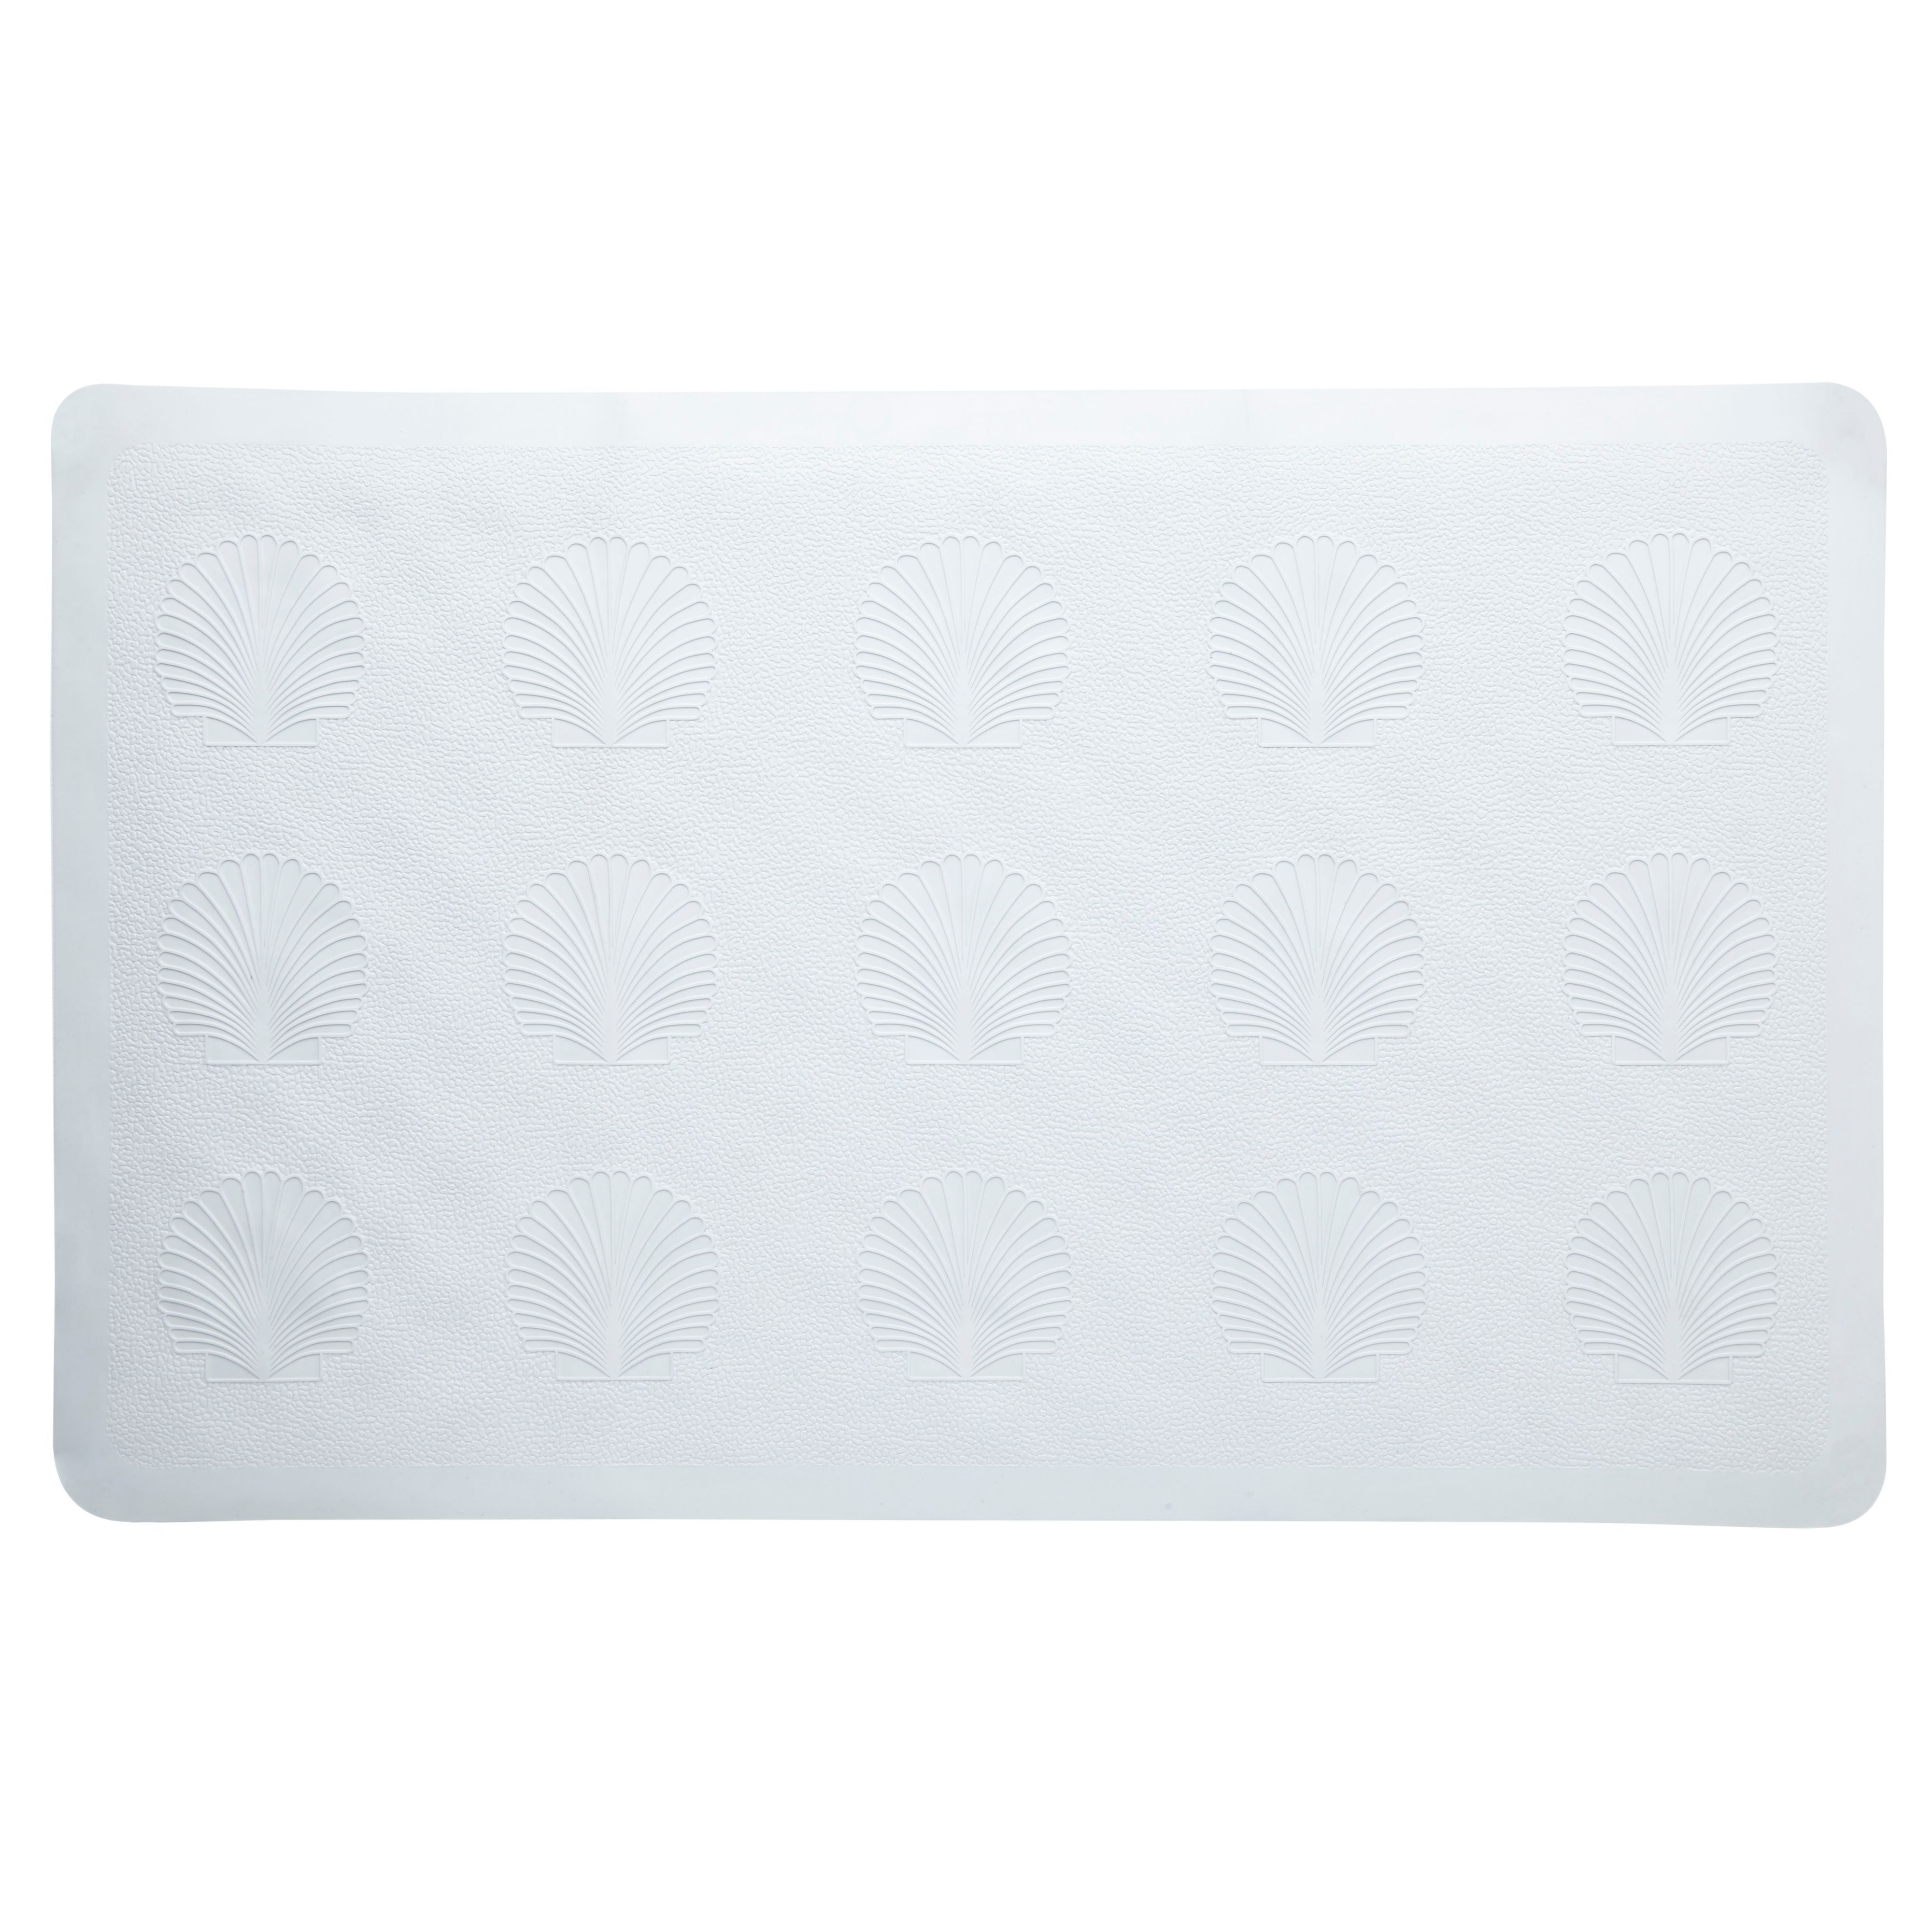 Value White Rubber Anti-slip Bath Mat (l)570mm (w)360mm